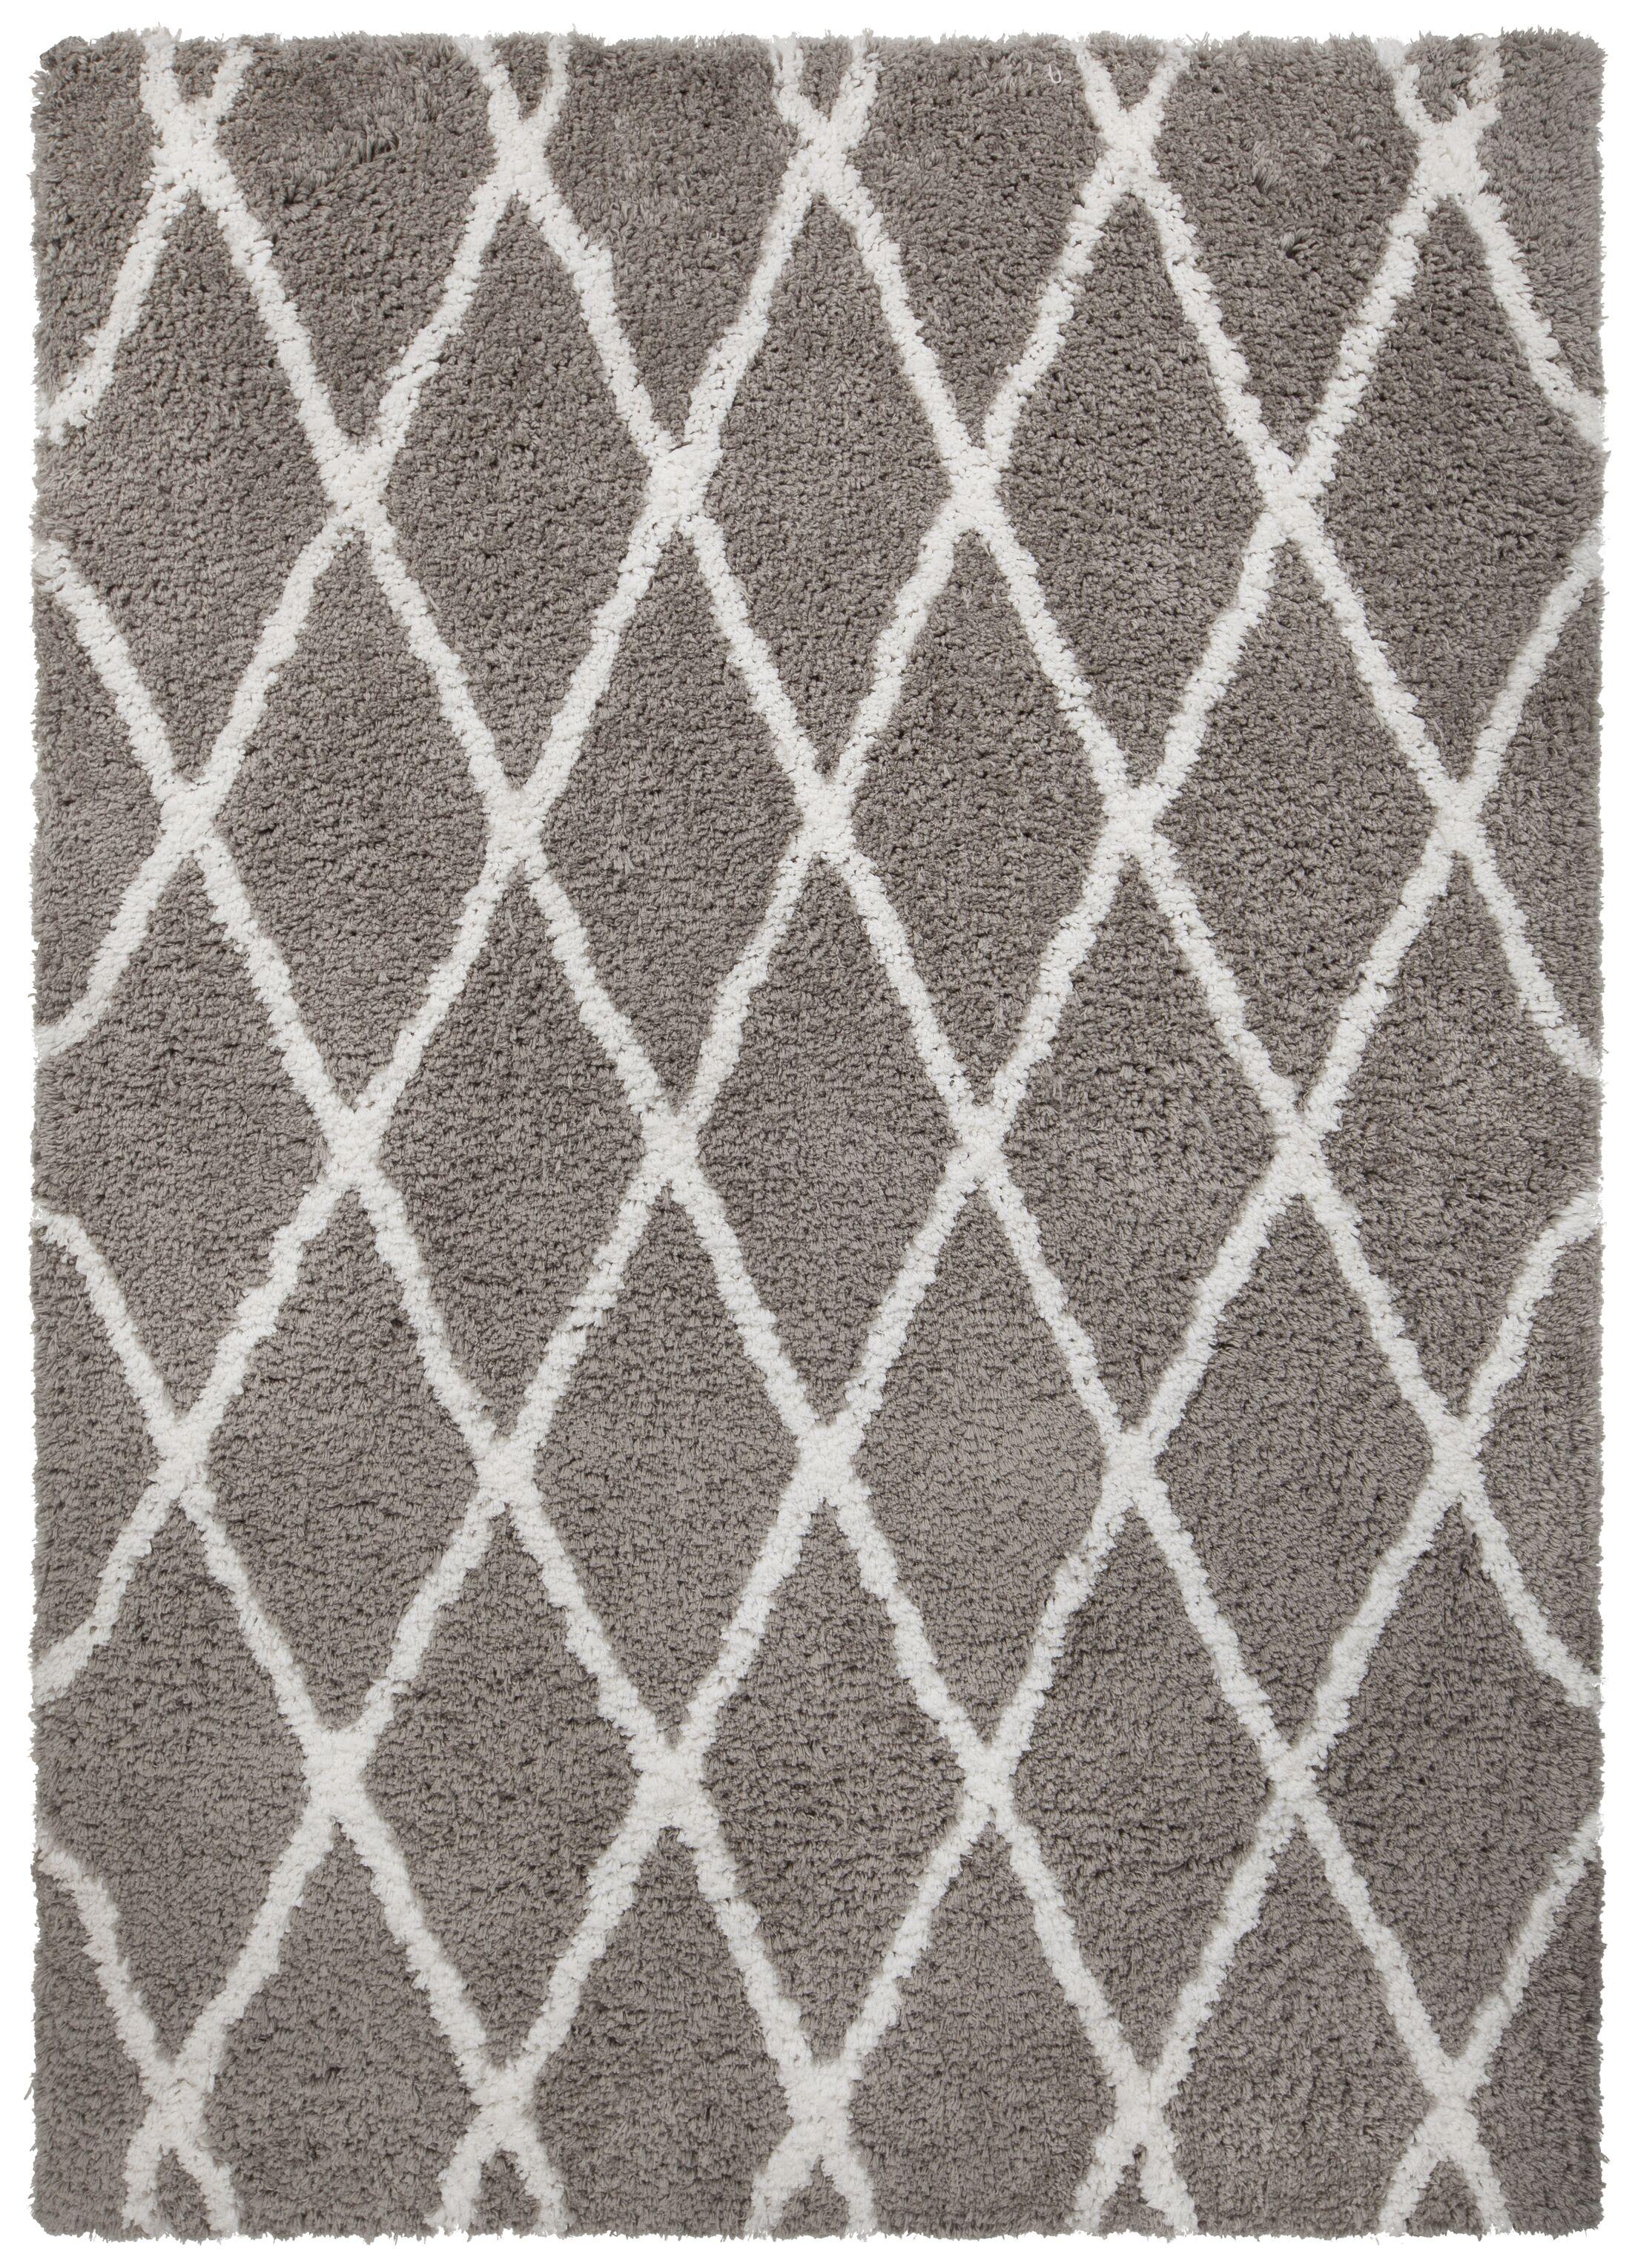 Mekhi Hand-Tufted Gray/White Area Rug Rug Size: Rectangle 5' x 7'6